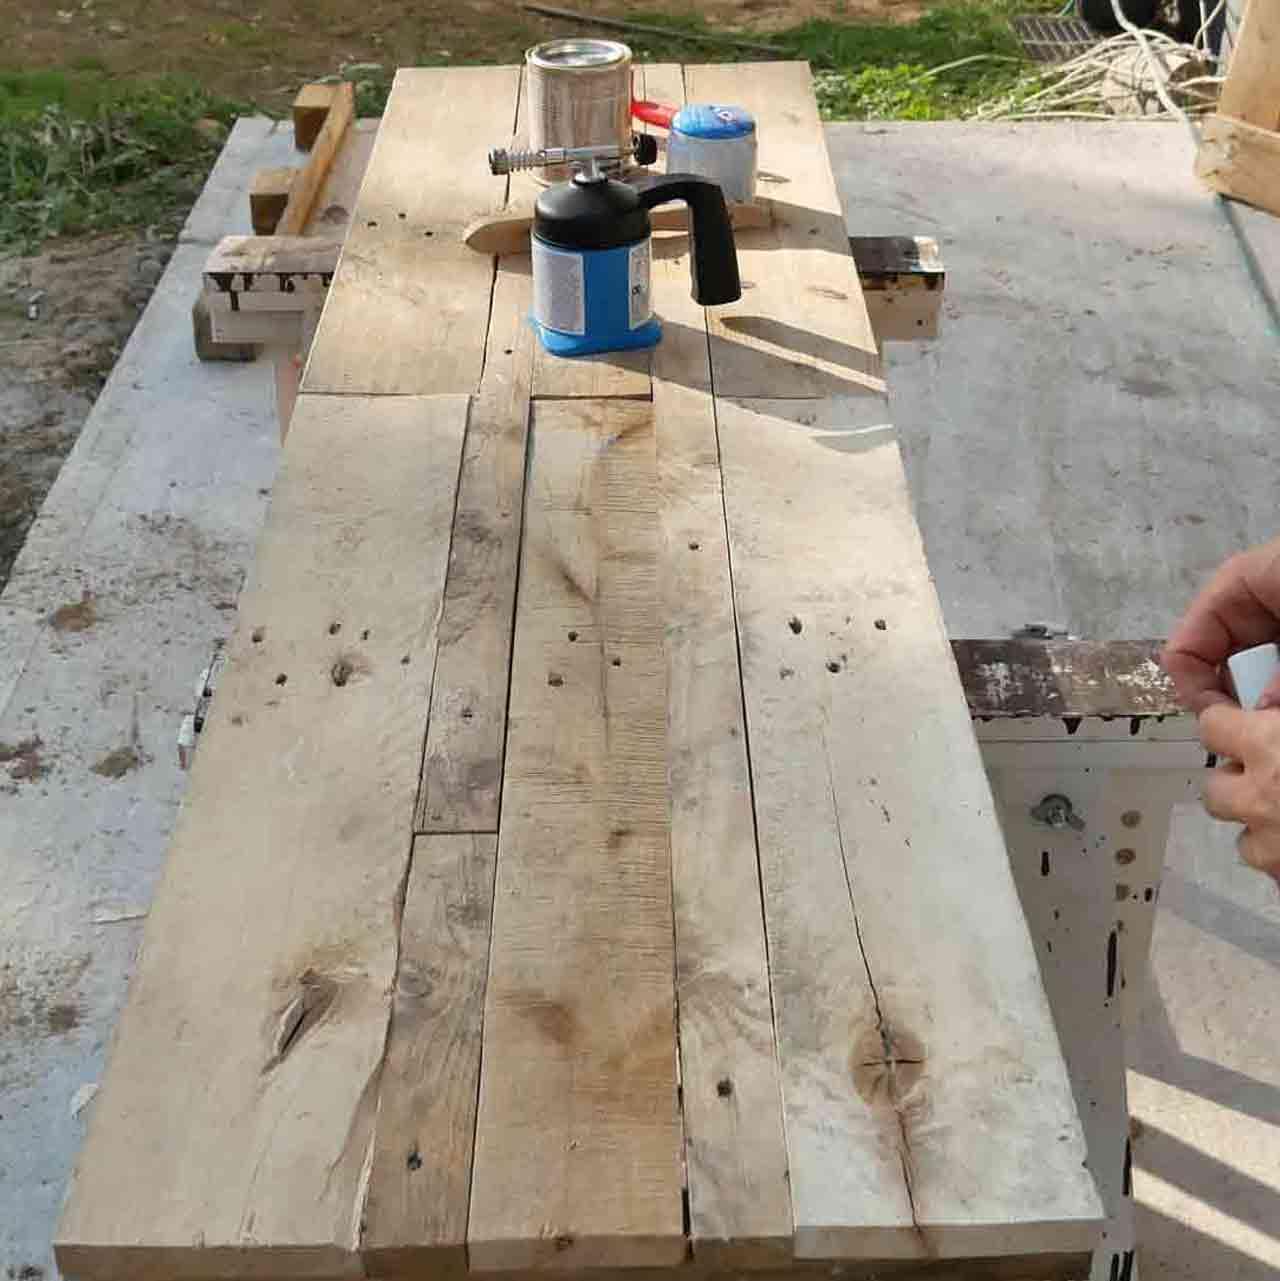 Berühmt Paletten, Holz altern lassen, abflammen - Made by myself - Dein EL06